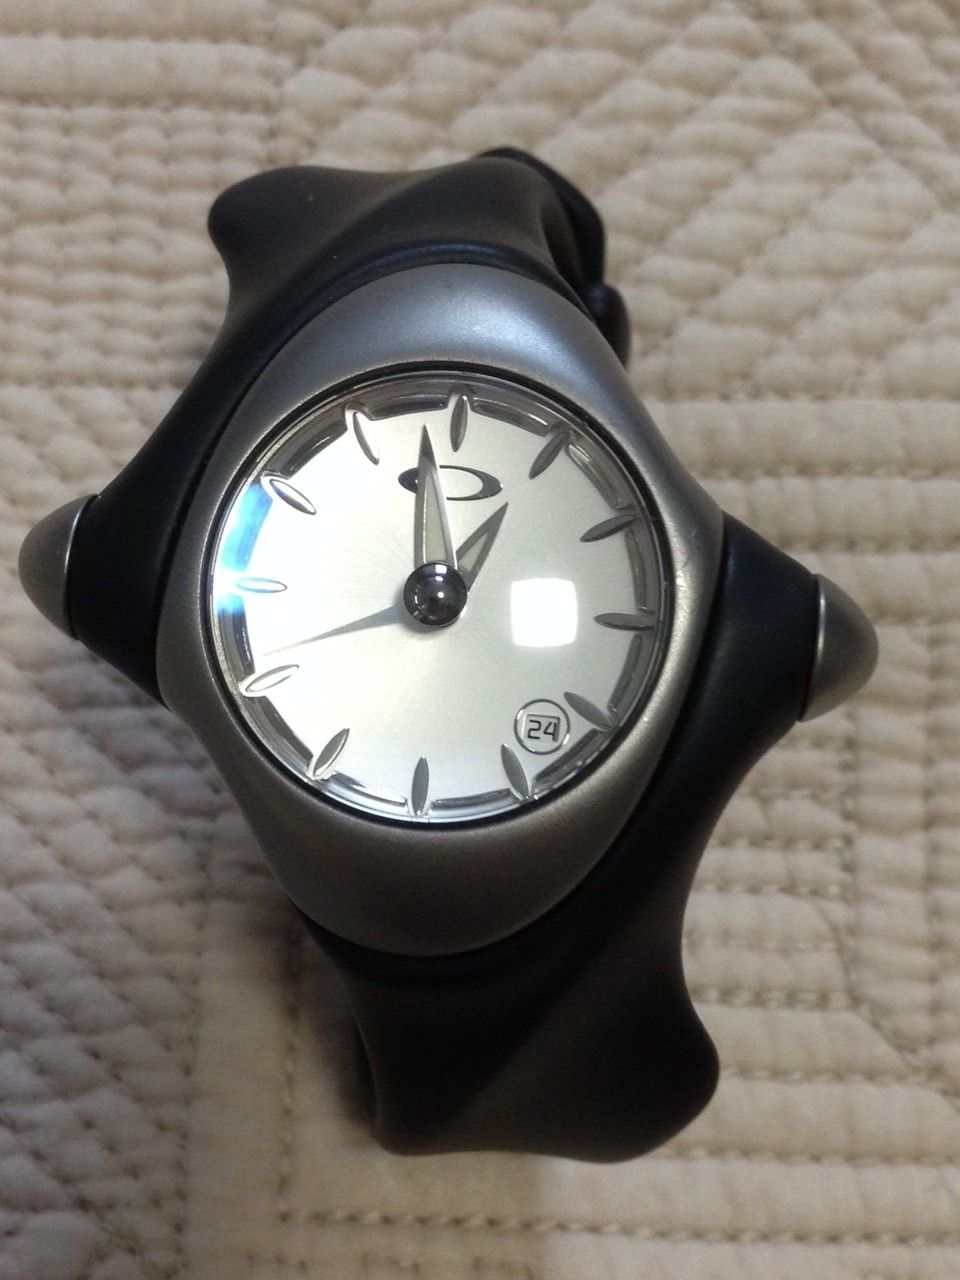 New Bullet Titanium Watch 10-110 - IMG_7792.JPG